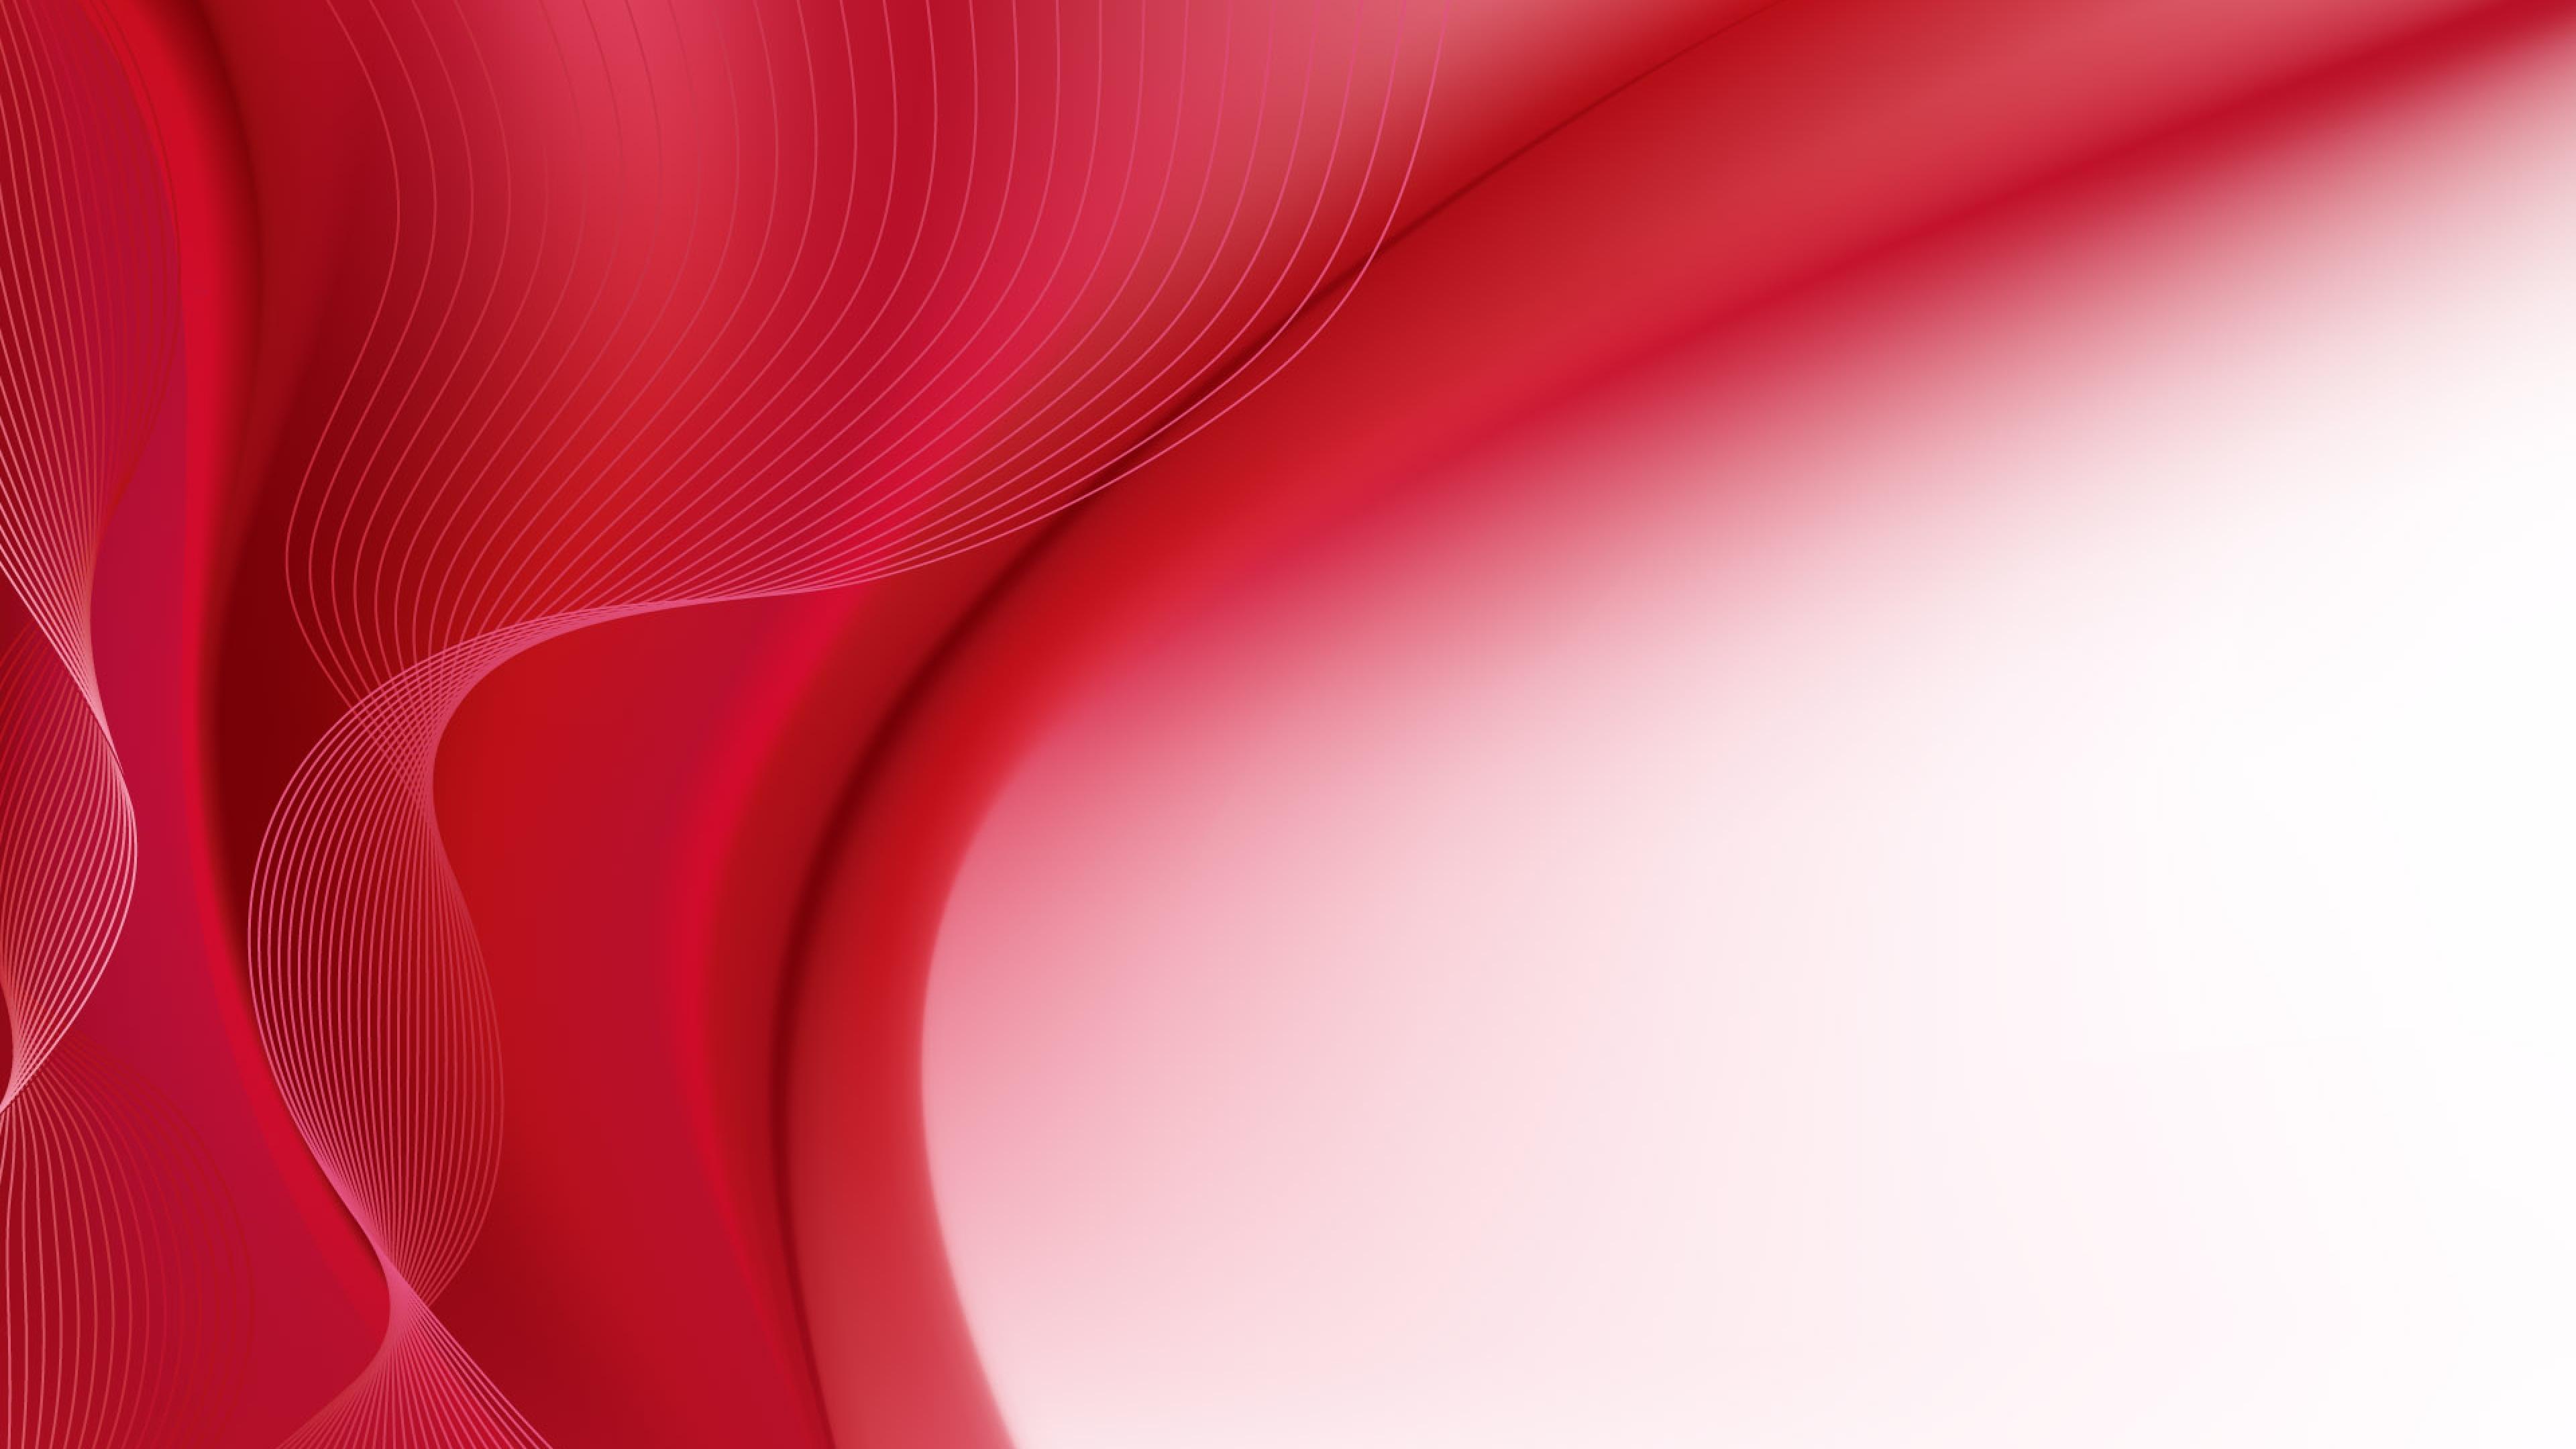 Green Animal Wallpaper Red Background Wallpaper Design Art 6425 Wallpaper